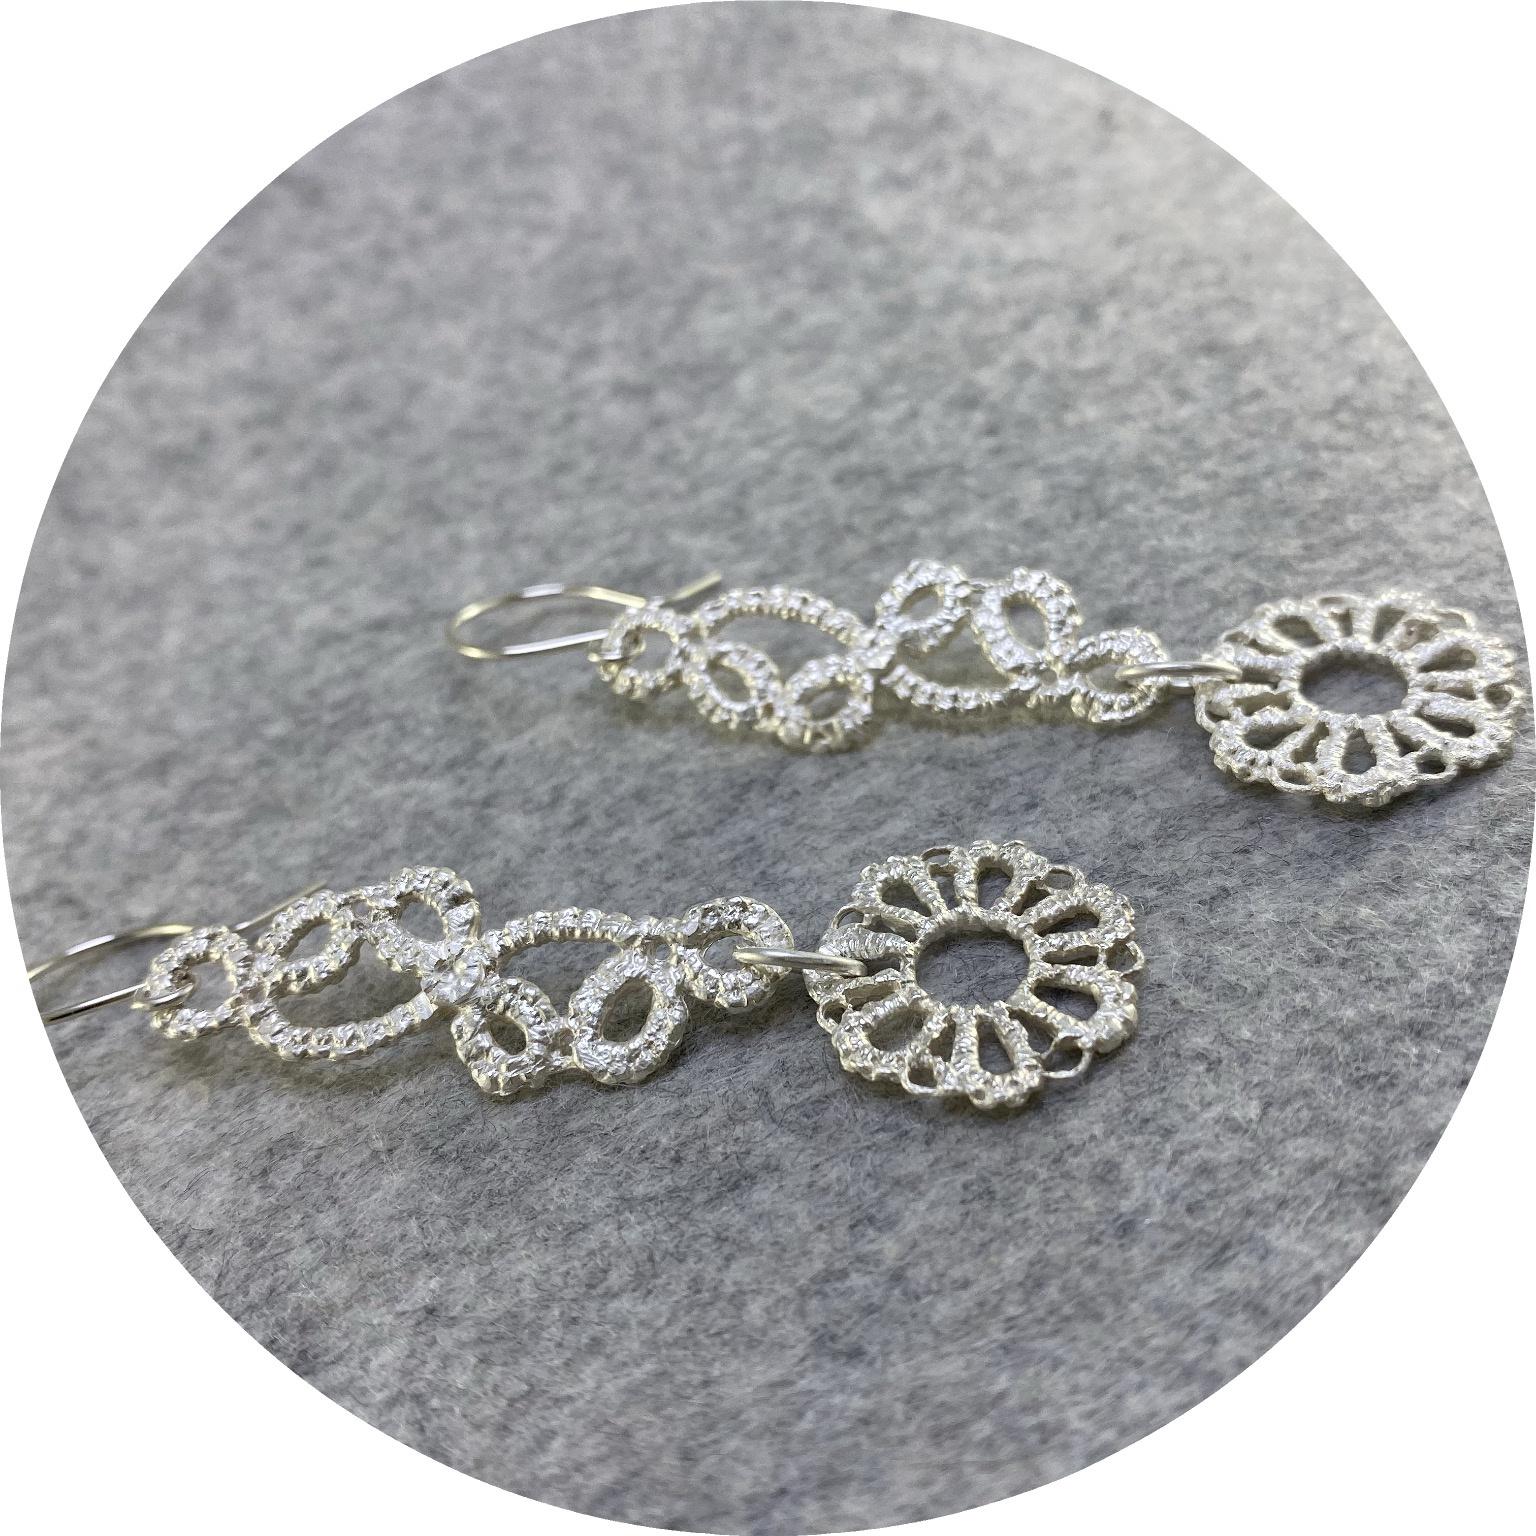 Pamela Camille- Tatted 7 petal flower lace drop leaf/stem earring. sterling silver.